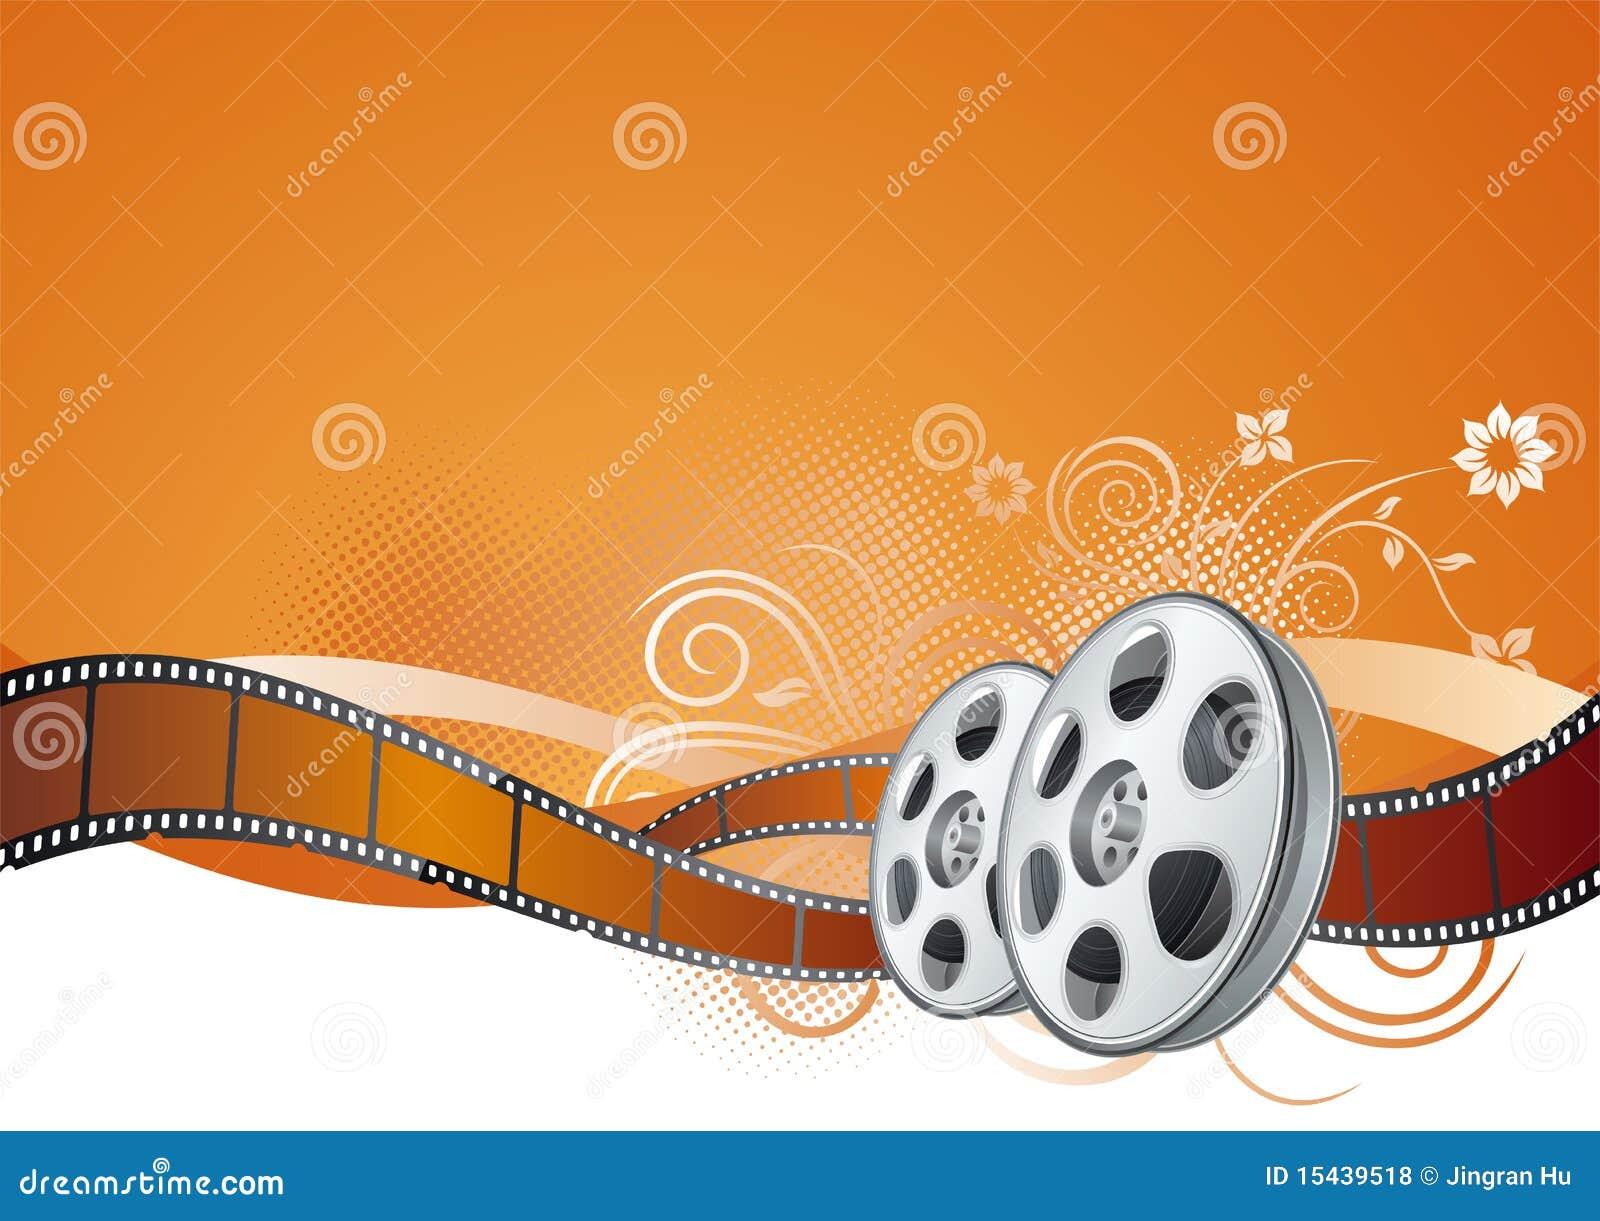 Royalty Free Stock Photos Film Strip Movie Theme Element Image15439518 on Language Arts Theme